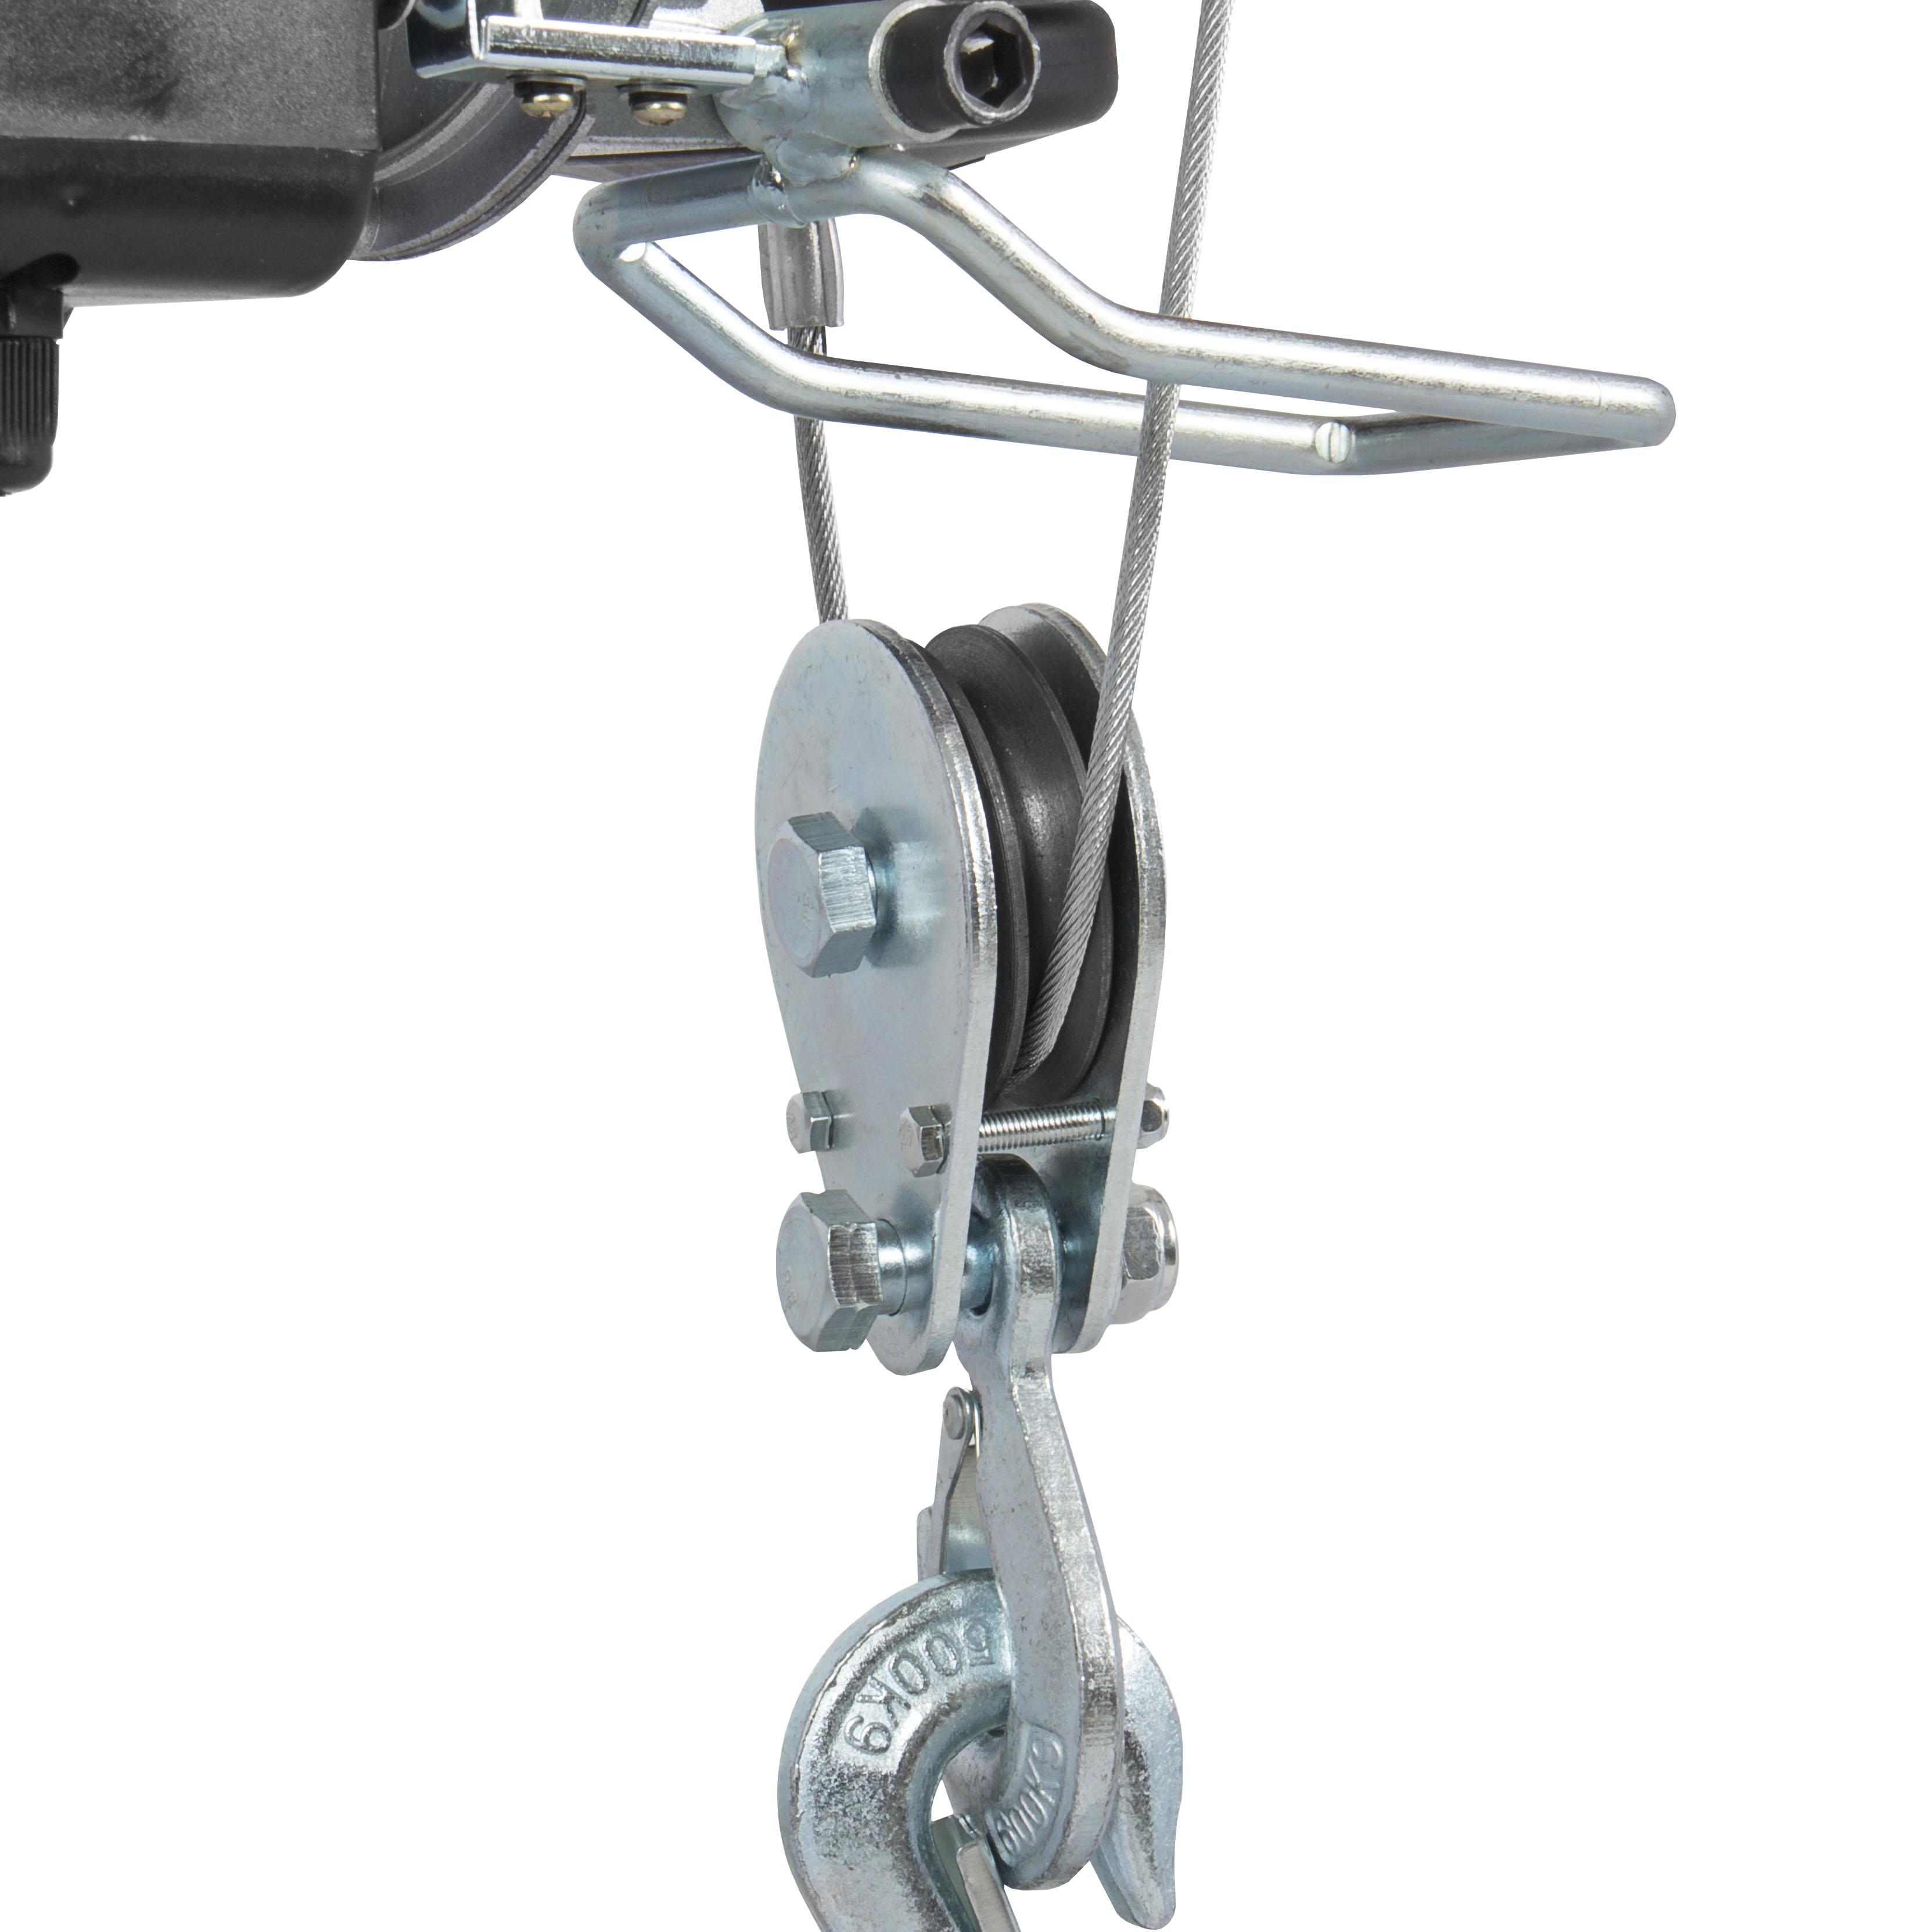 Overhead Crane Winch : Lb pro electric motor overhead winch hoist crane lift